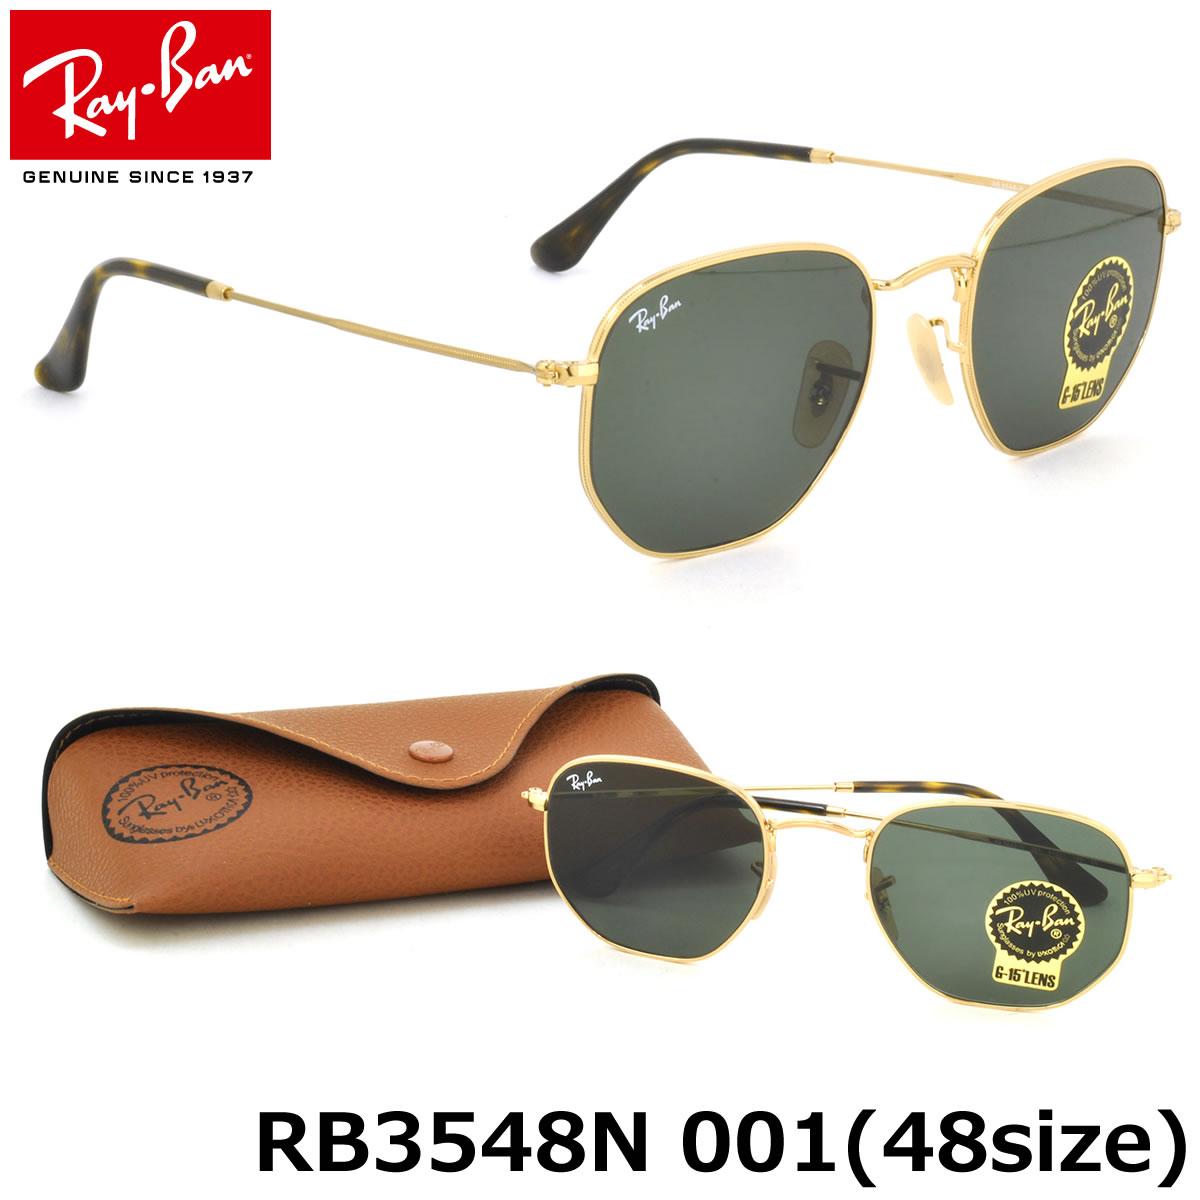 797ef7dd99 Ray Ban Sunglasses Warranty Tol8 « One More Soul